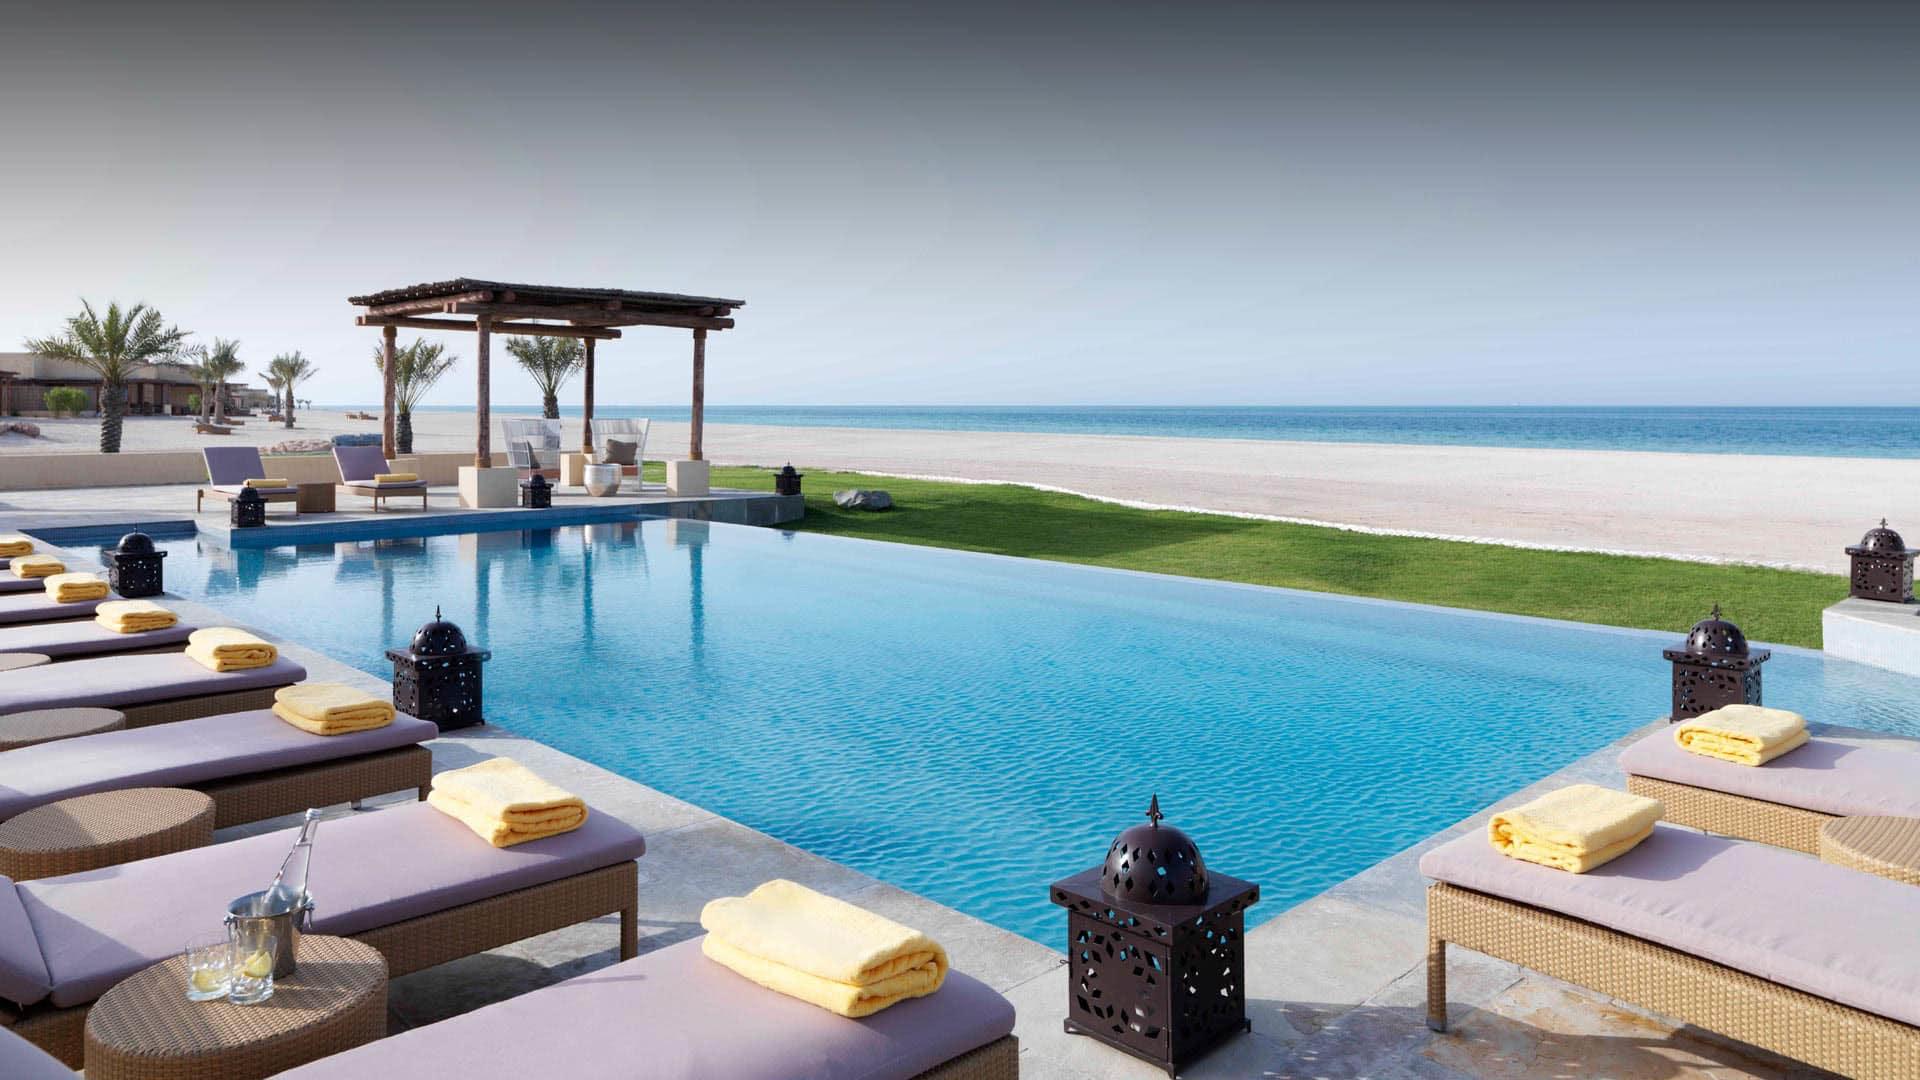 https://assets.anantara.com/image/upload/q_auto,f_auto/media/minor/anantara/images/anantara-sir-bani-yas-island-al-yamm-villa-resort/the-resort/desktop-banner/anantara_al_yamm_header_1920x1080.jpg